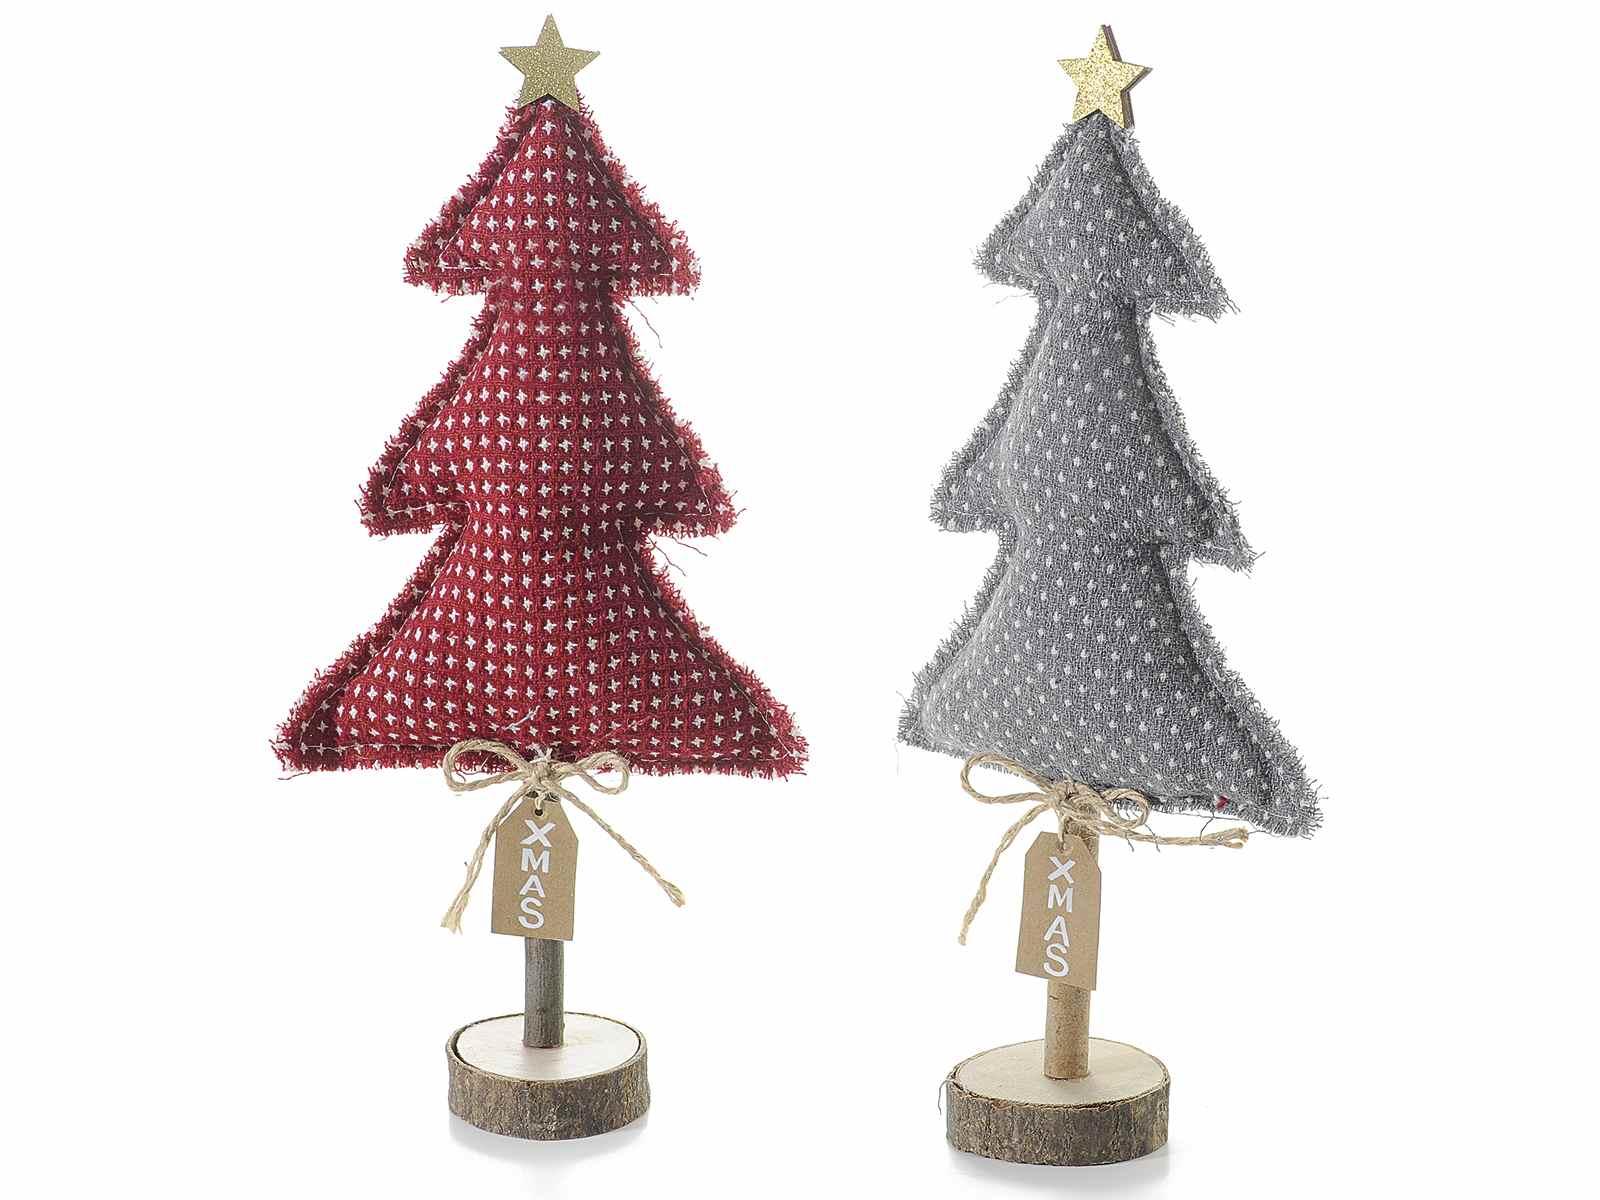 Arbol de navidad de tela podis bolas de navidad de tela - Arbol de navidad de tela ...